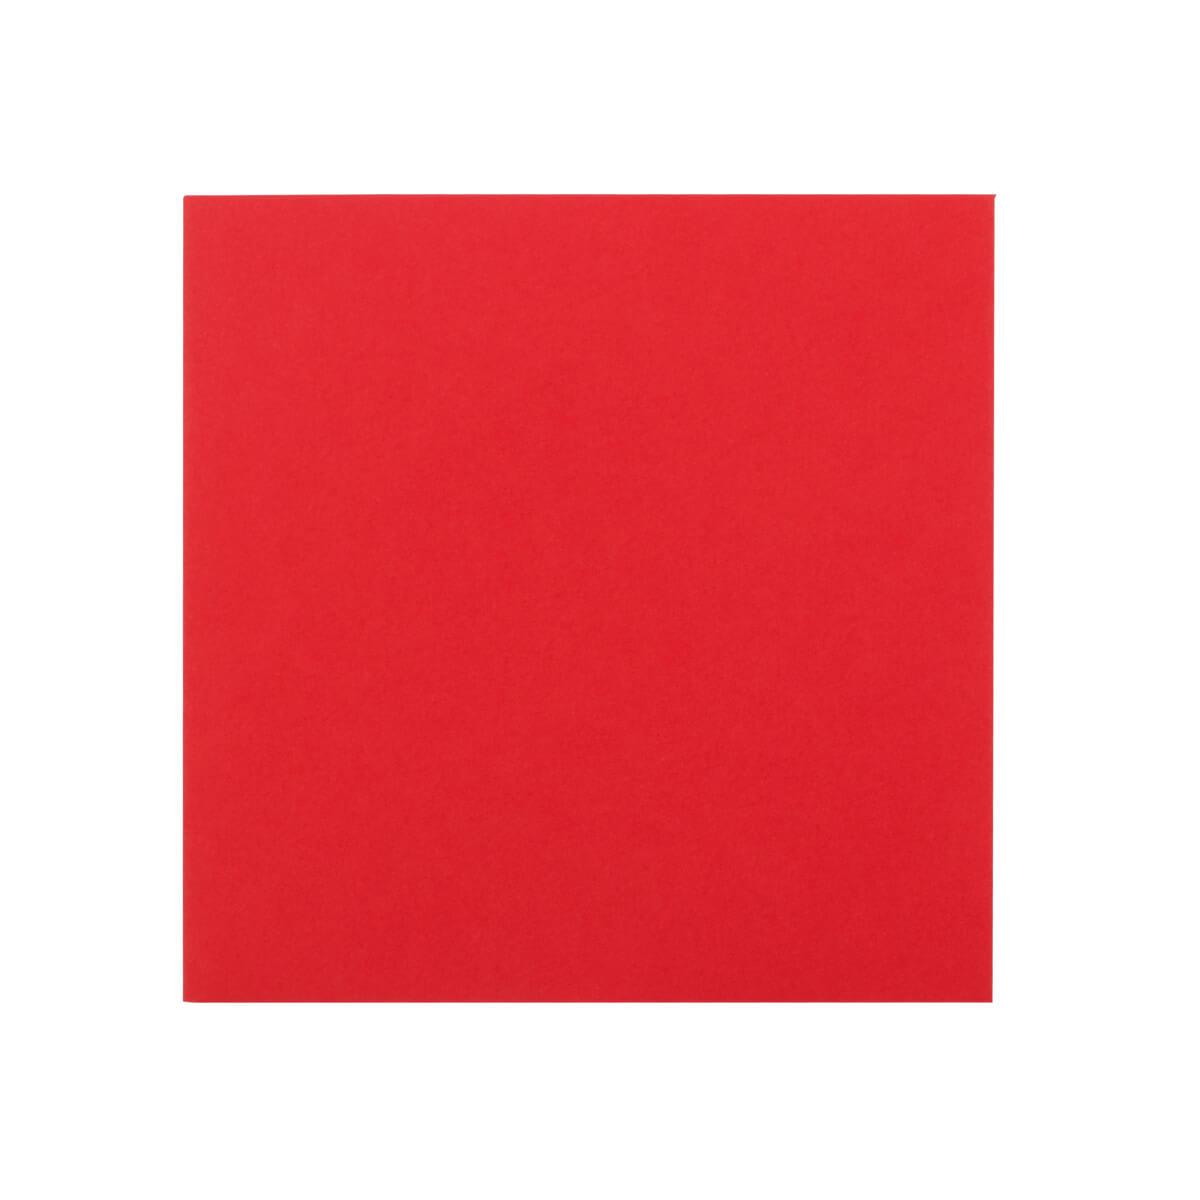 BRIGHT RED 130MM SQUARE ENVELOPES 120GSM